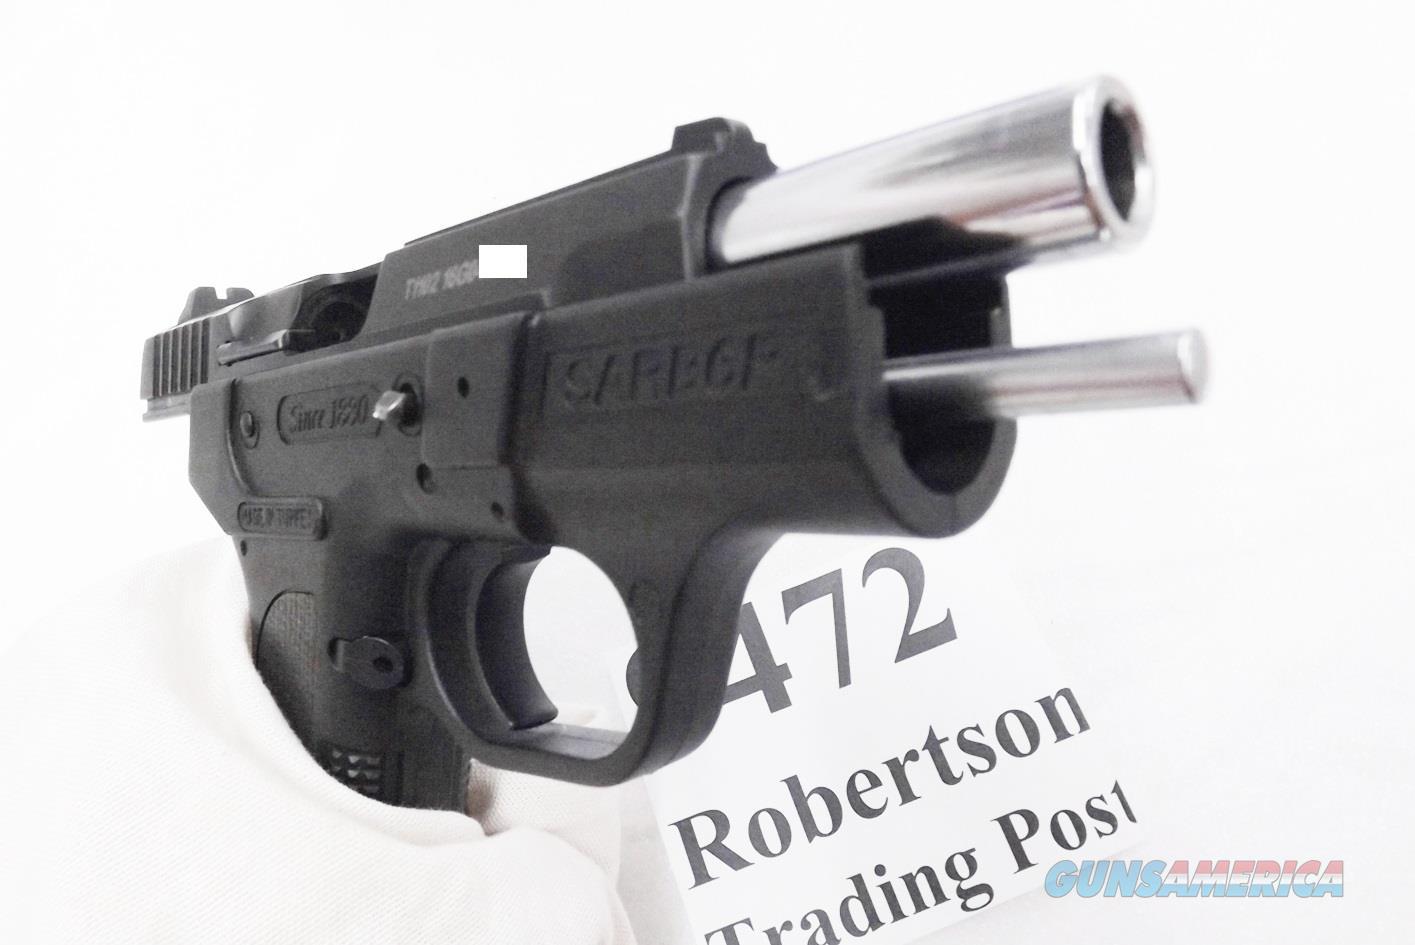 CZ75 P01 Clone SAR Arms EAA 9mm model SARB6P9 Compact 3 Dot Sights 14 shot  1 Magazine Commander Hammer 3 1/2 inch K2 K-2 CZ Mag Compatible 400424